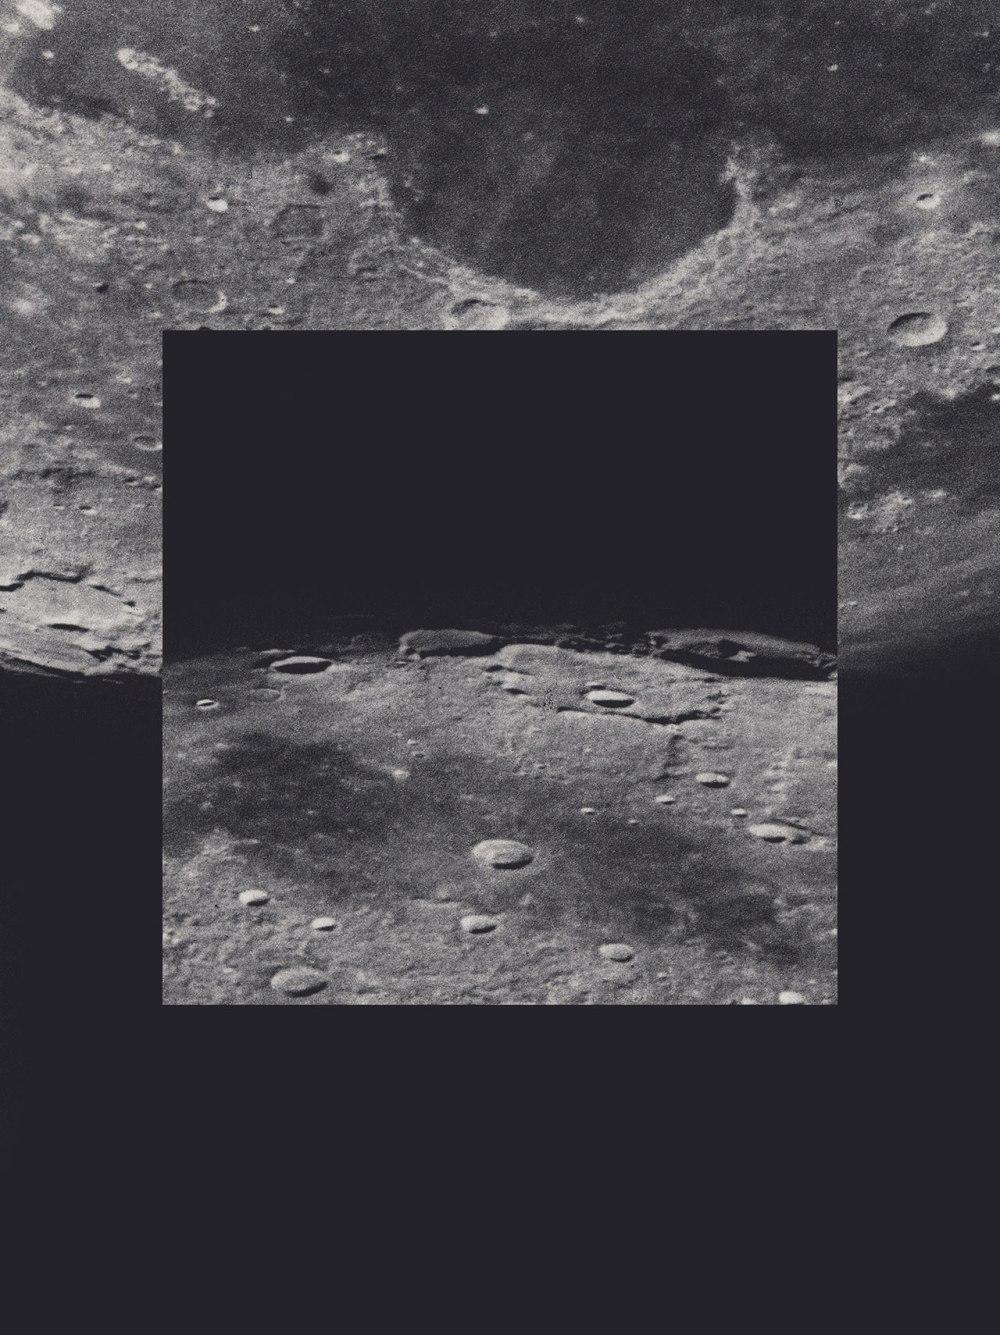 f5_luis_dourado_moons_isolation8_yatzer